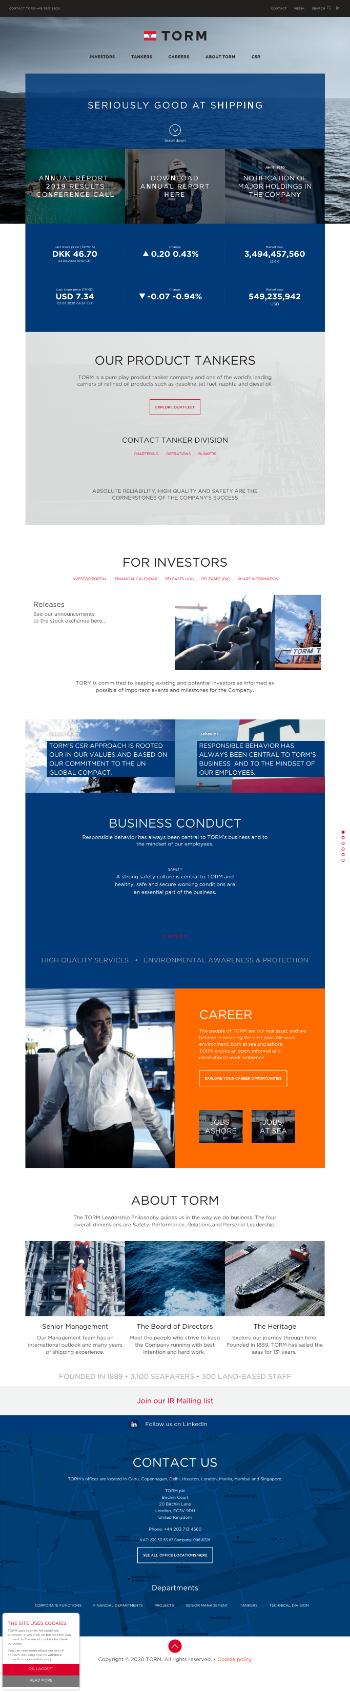 TORM plc Website Screenshot